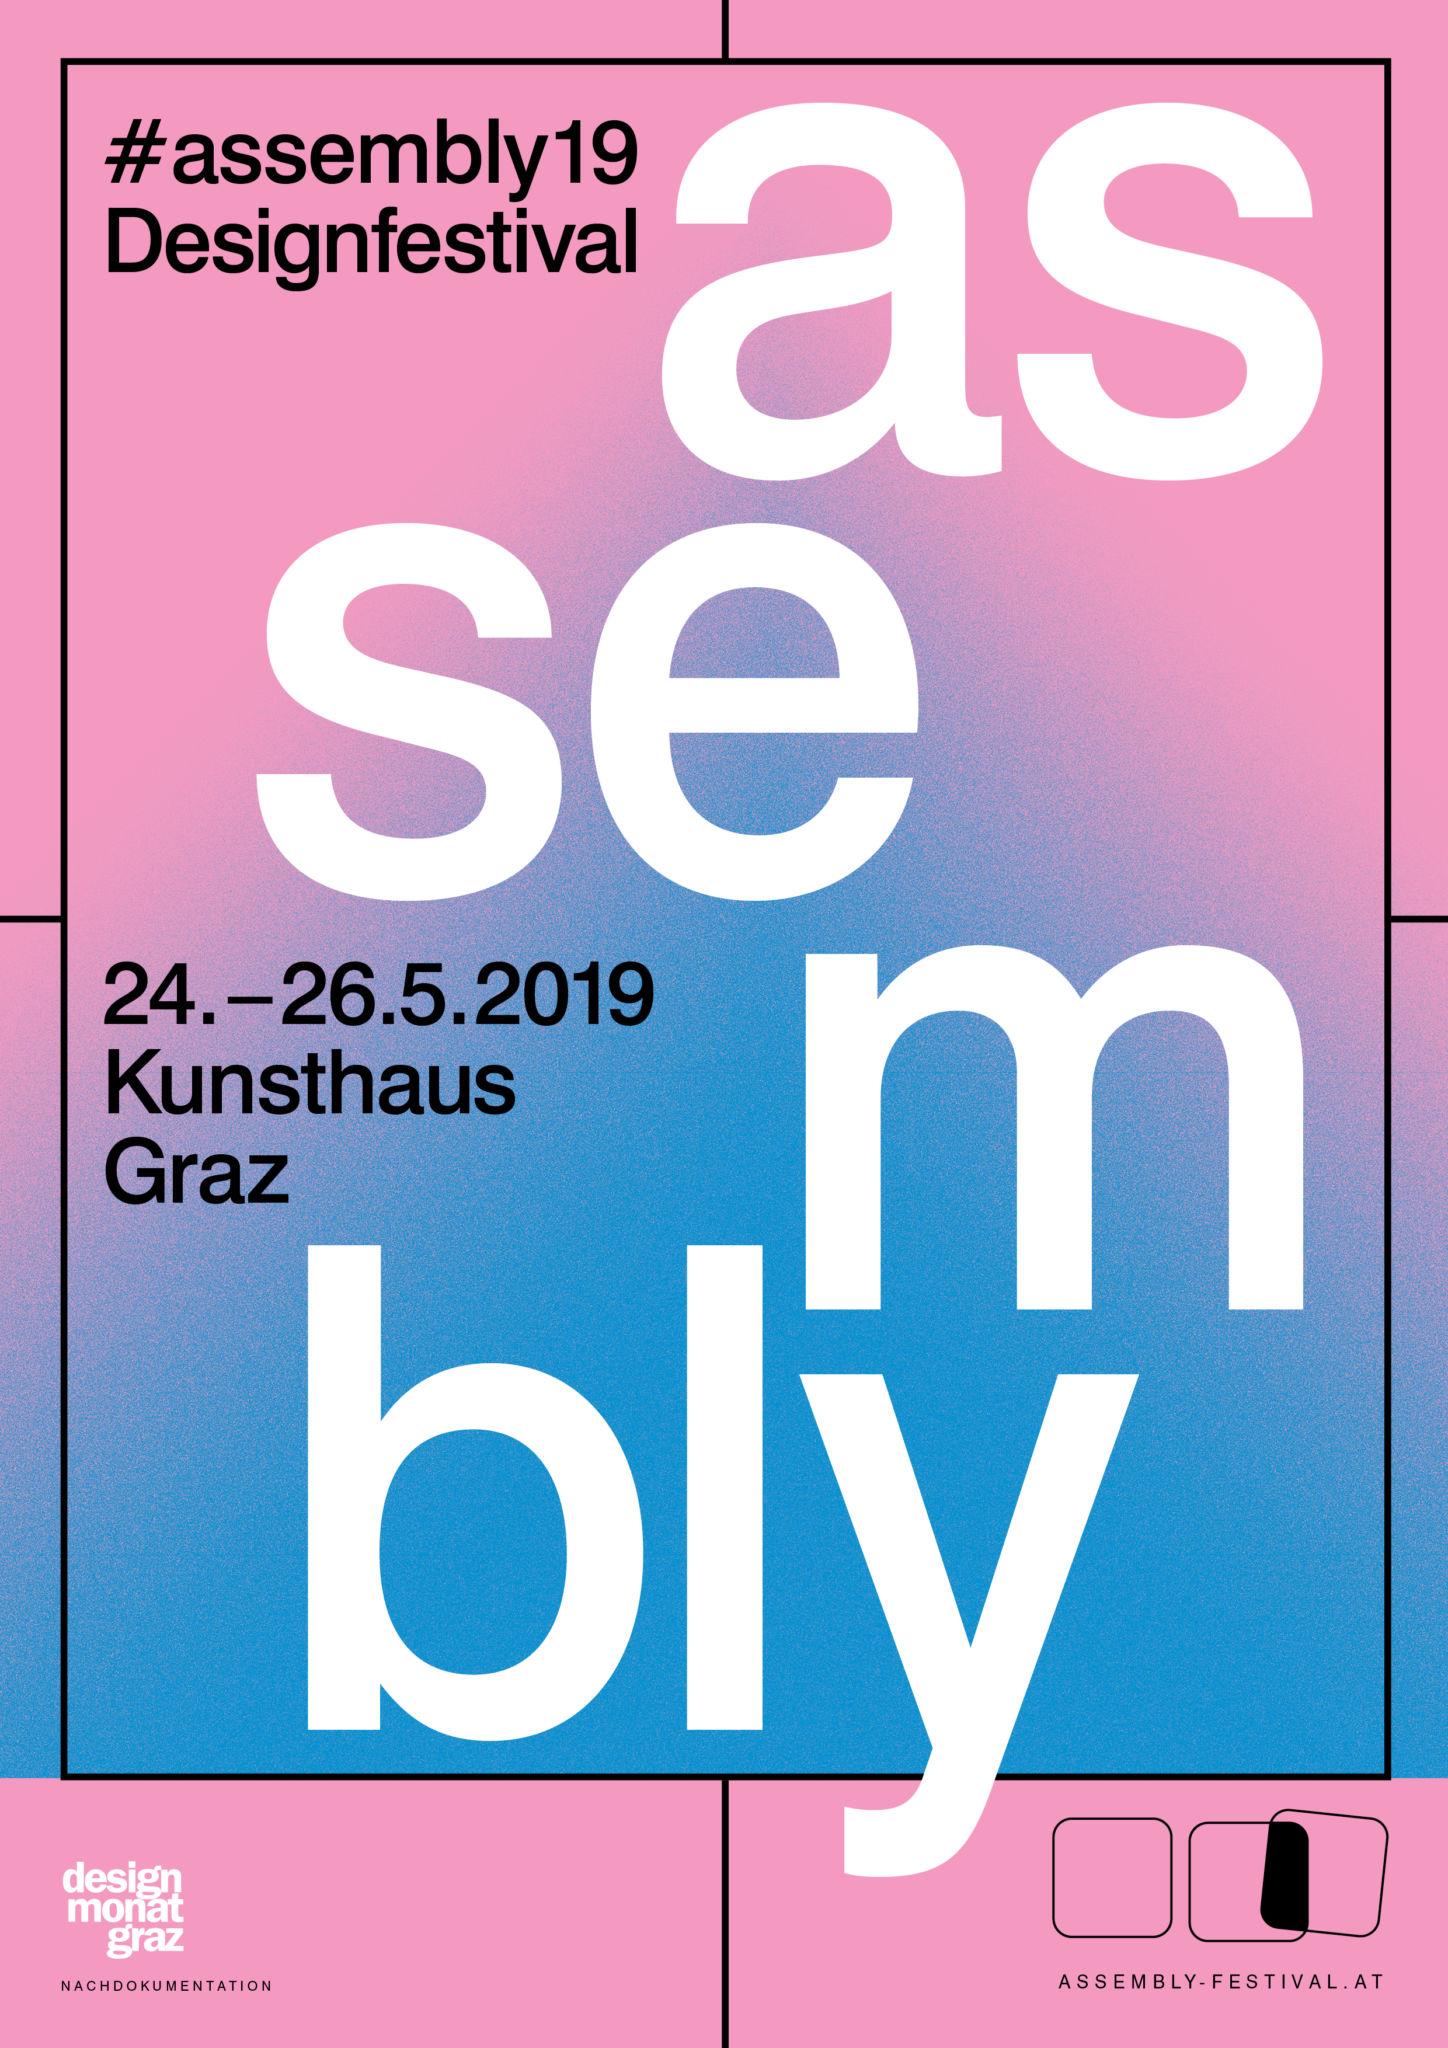 assembly Festival Archive 2019